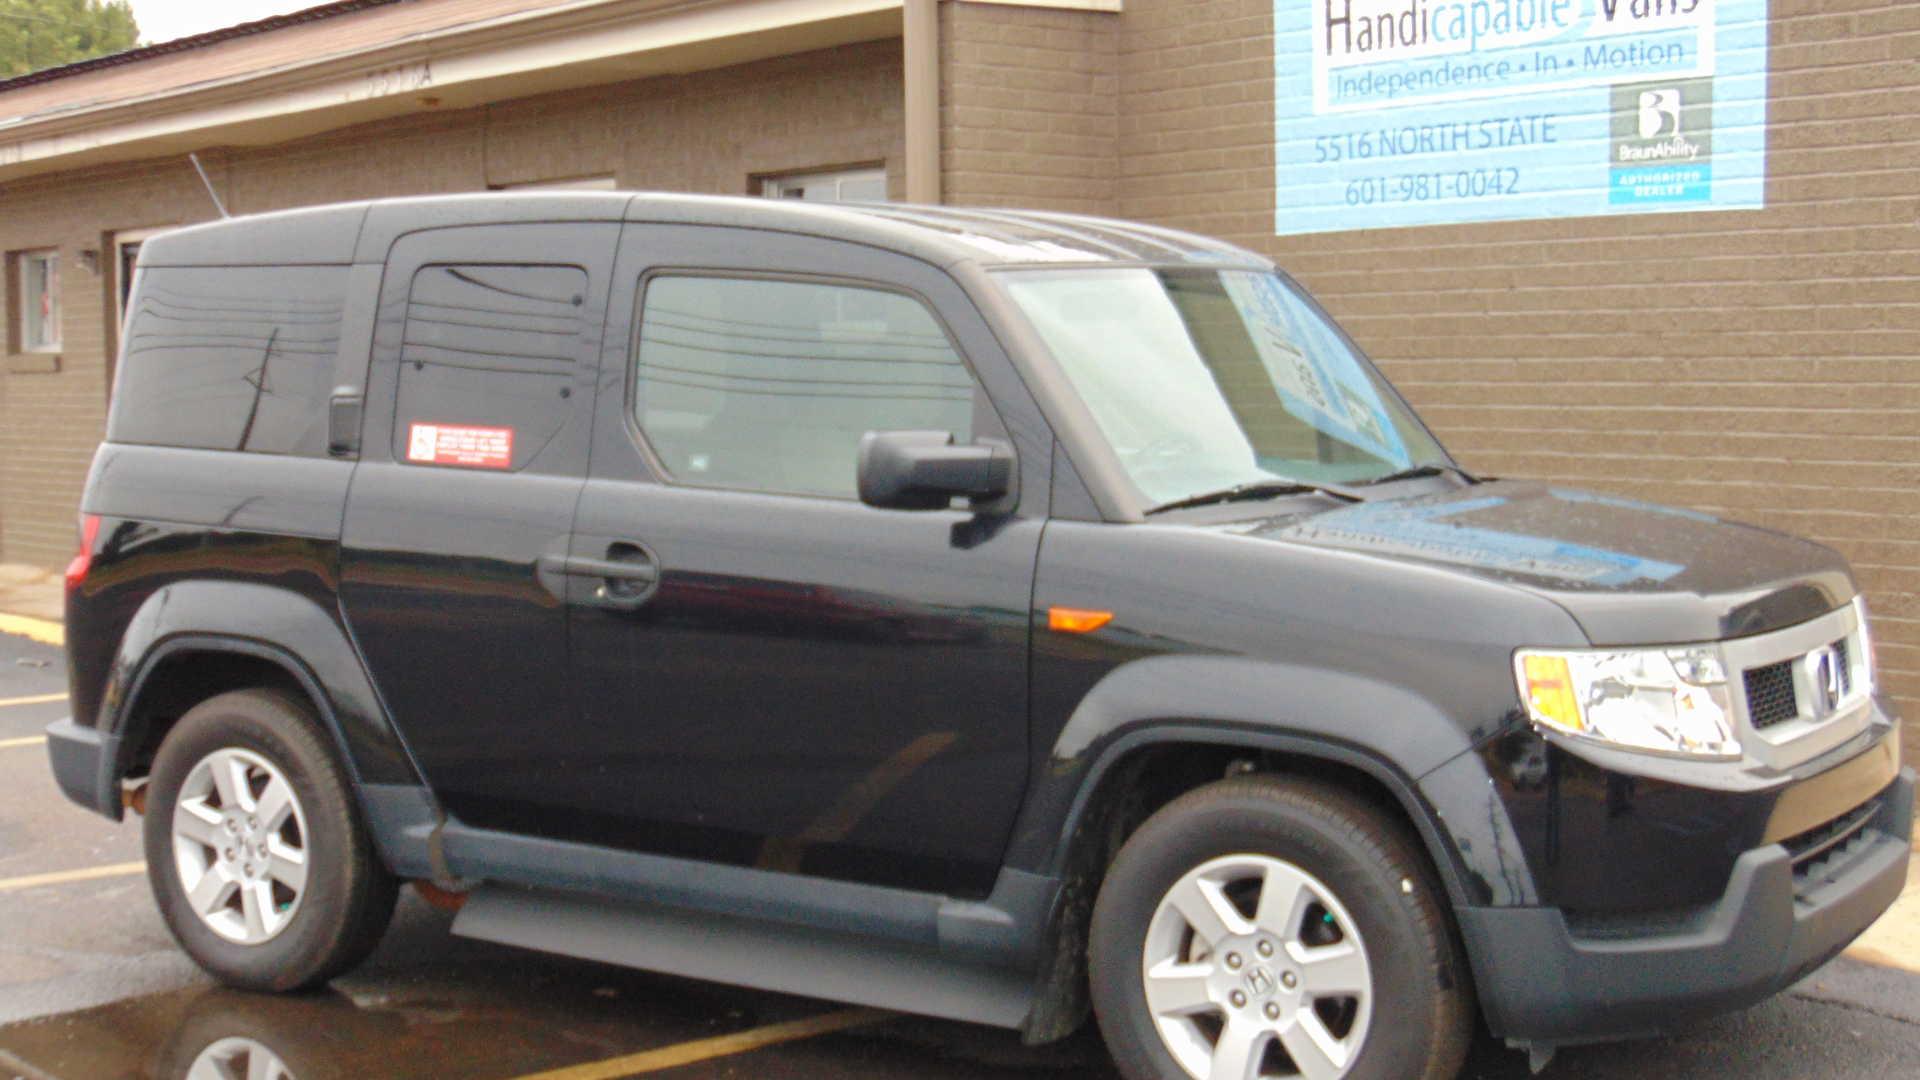 Freedom Motors Freedom Motors Honda Element Conversion. Call For Price